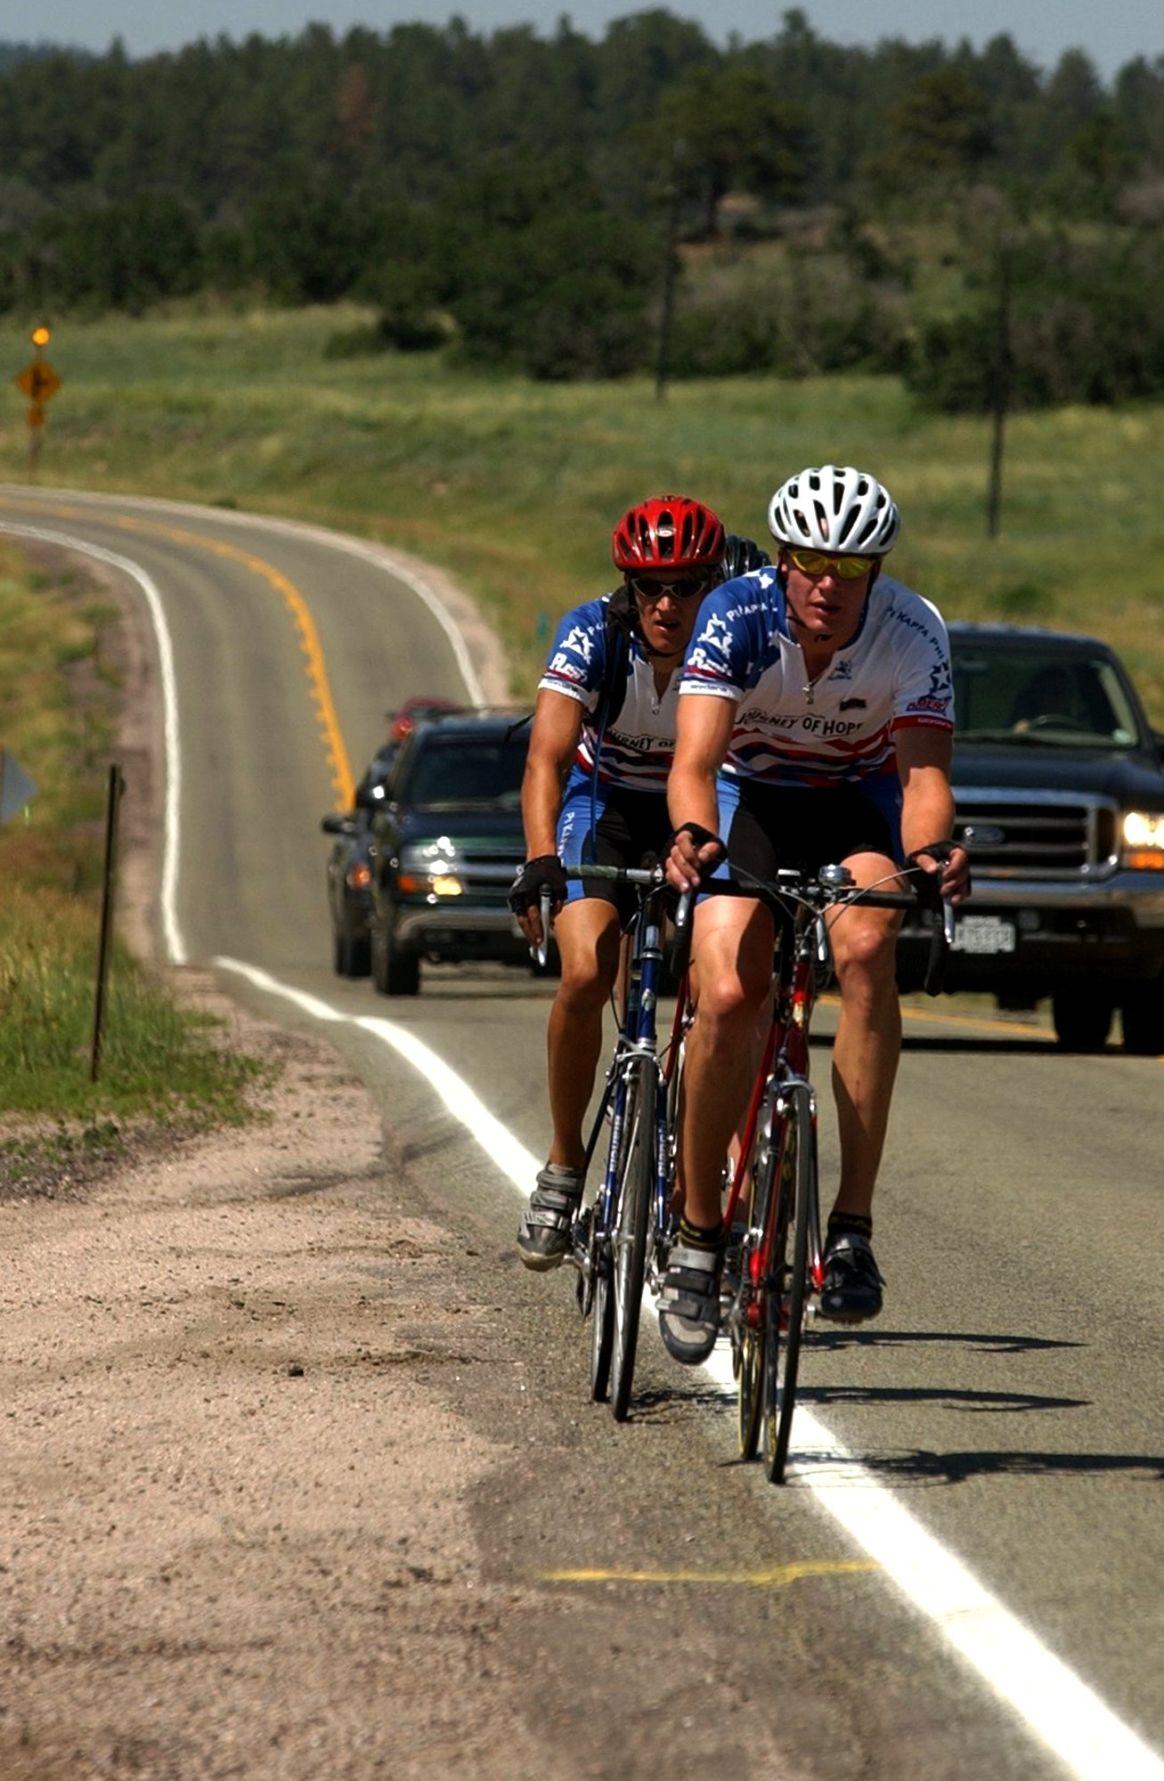 Hit The Road Pikes Peak Region Offers Great Bike Rides Colorado Springs News Gazette Com